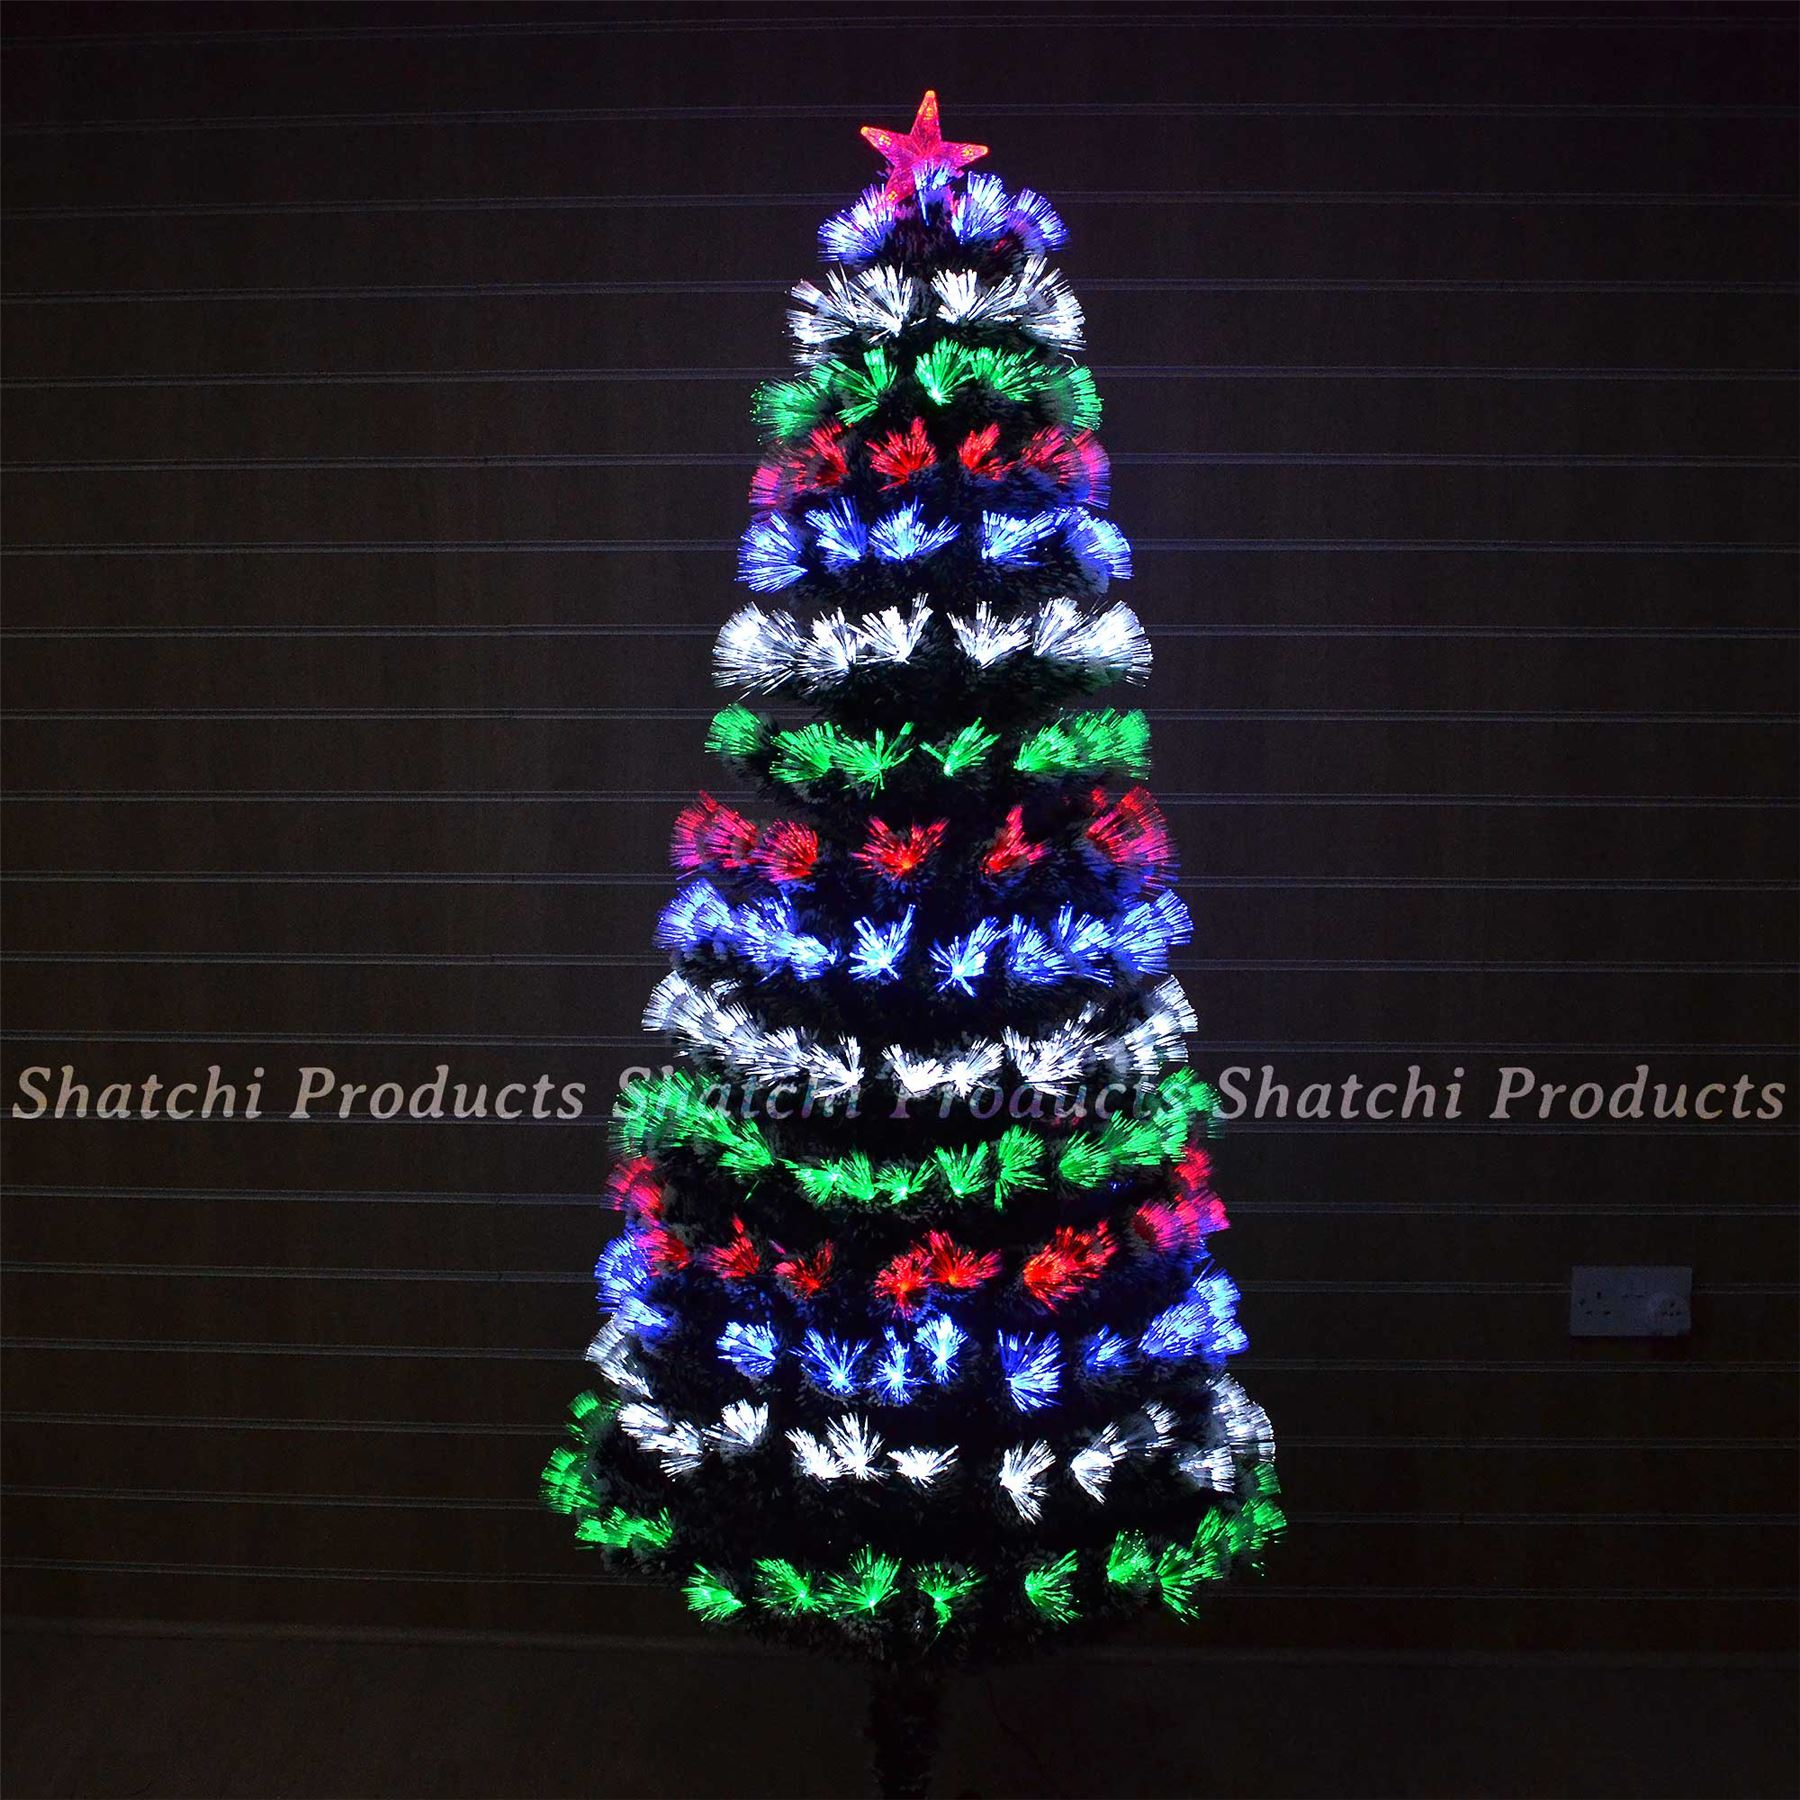 3ft Christmas Trees Artificial: LED Fibre Optic Christmas Tree Pre Lit Xmas Tree 2ft, 3ft